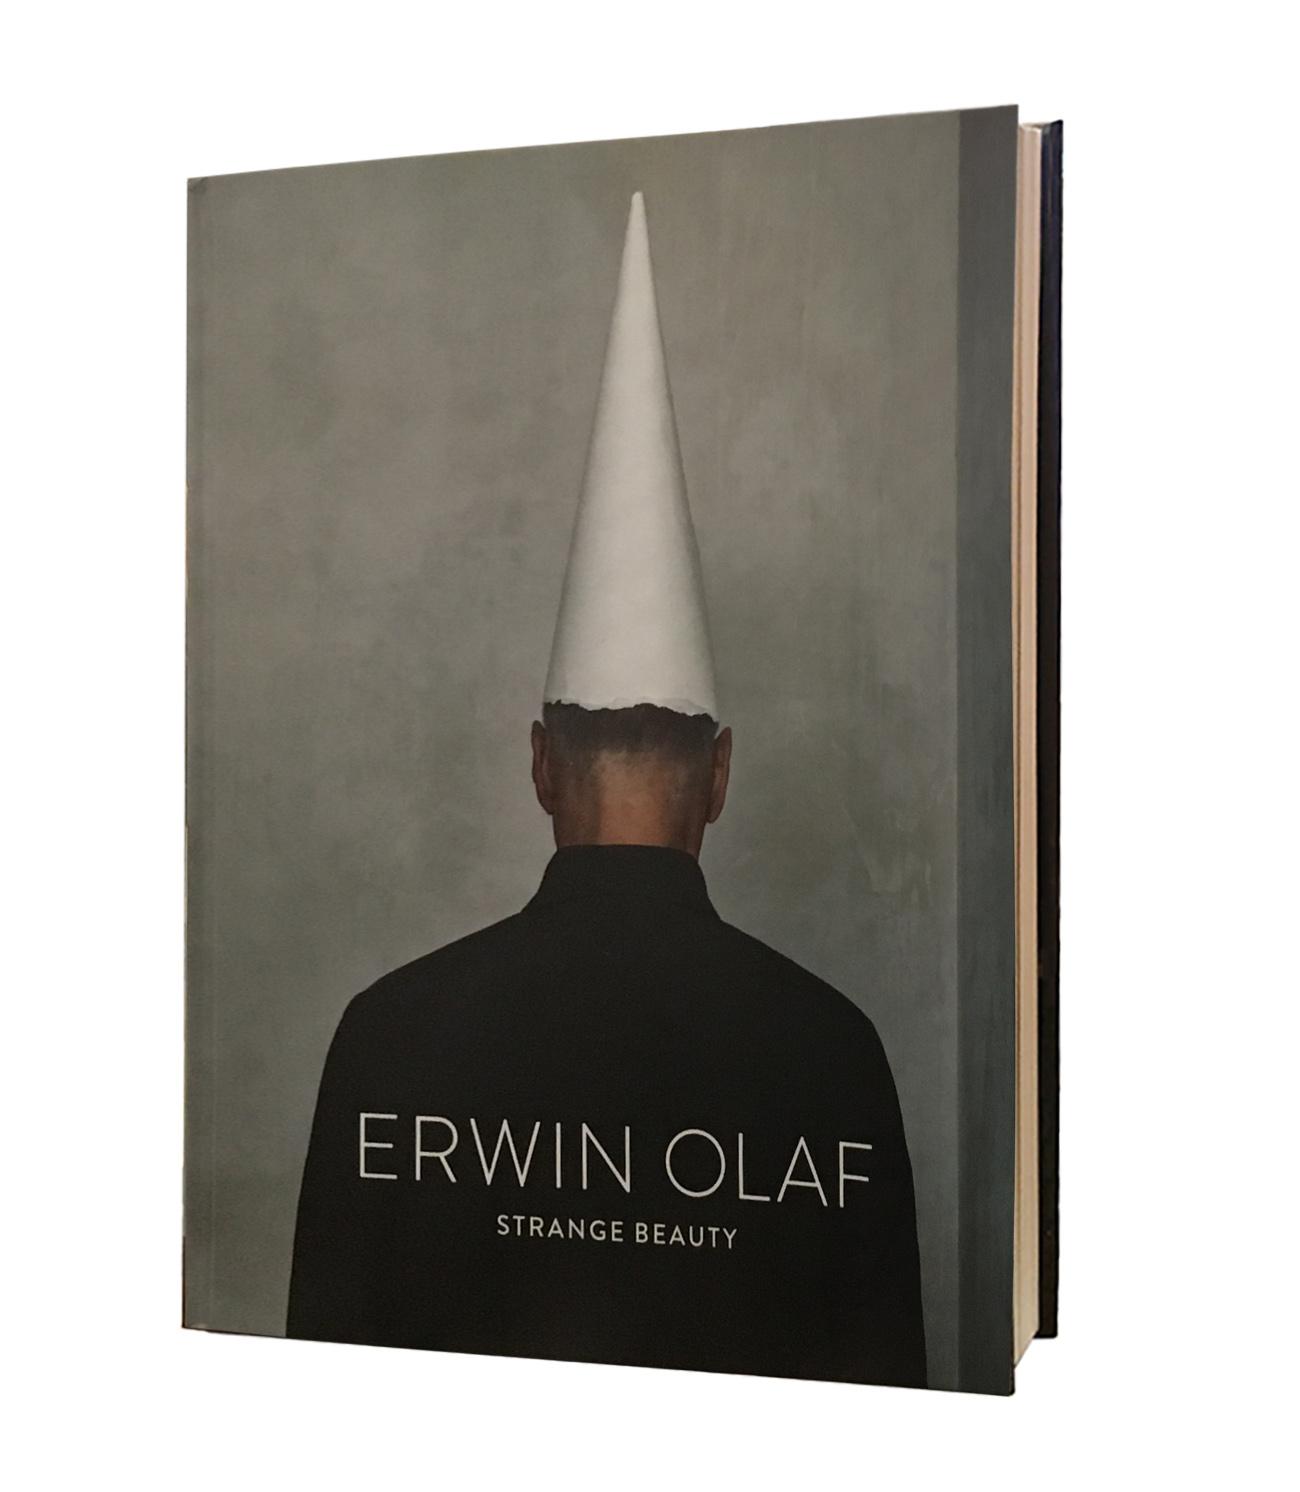 Katalog Erwin Olaf (Englisch)